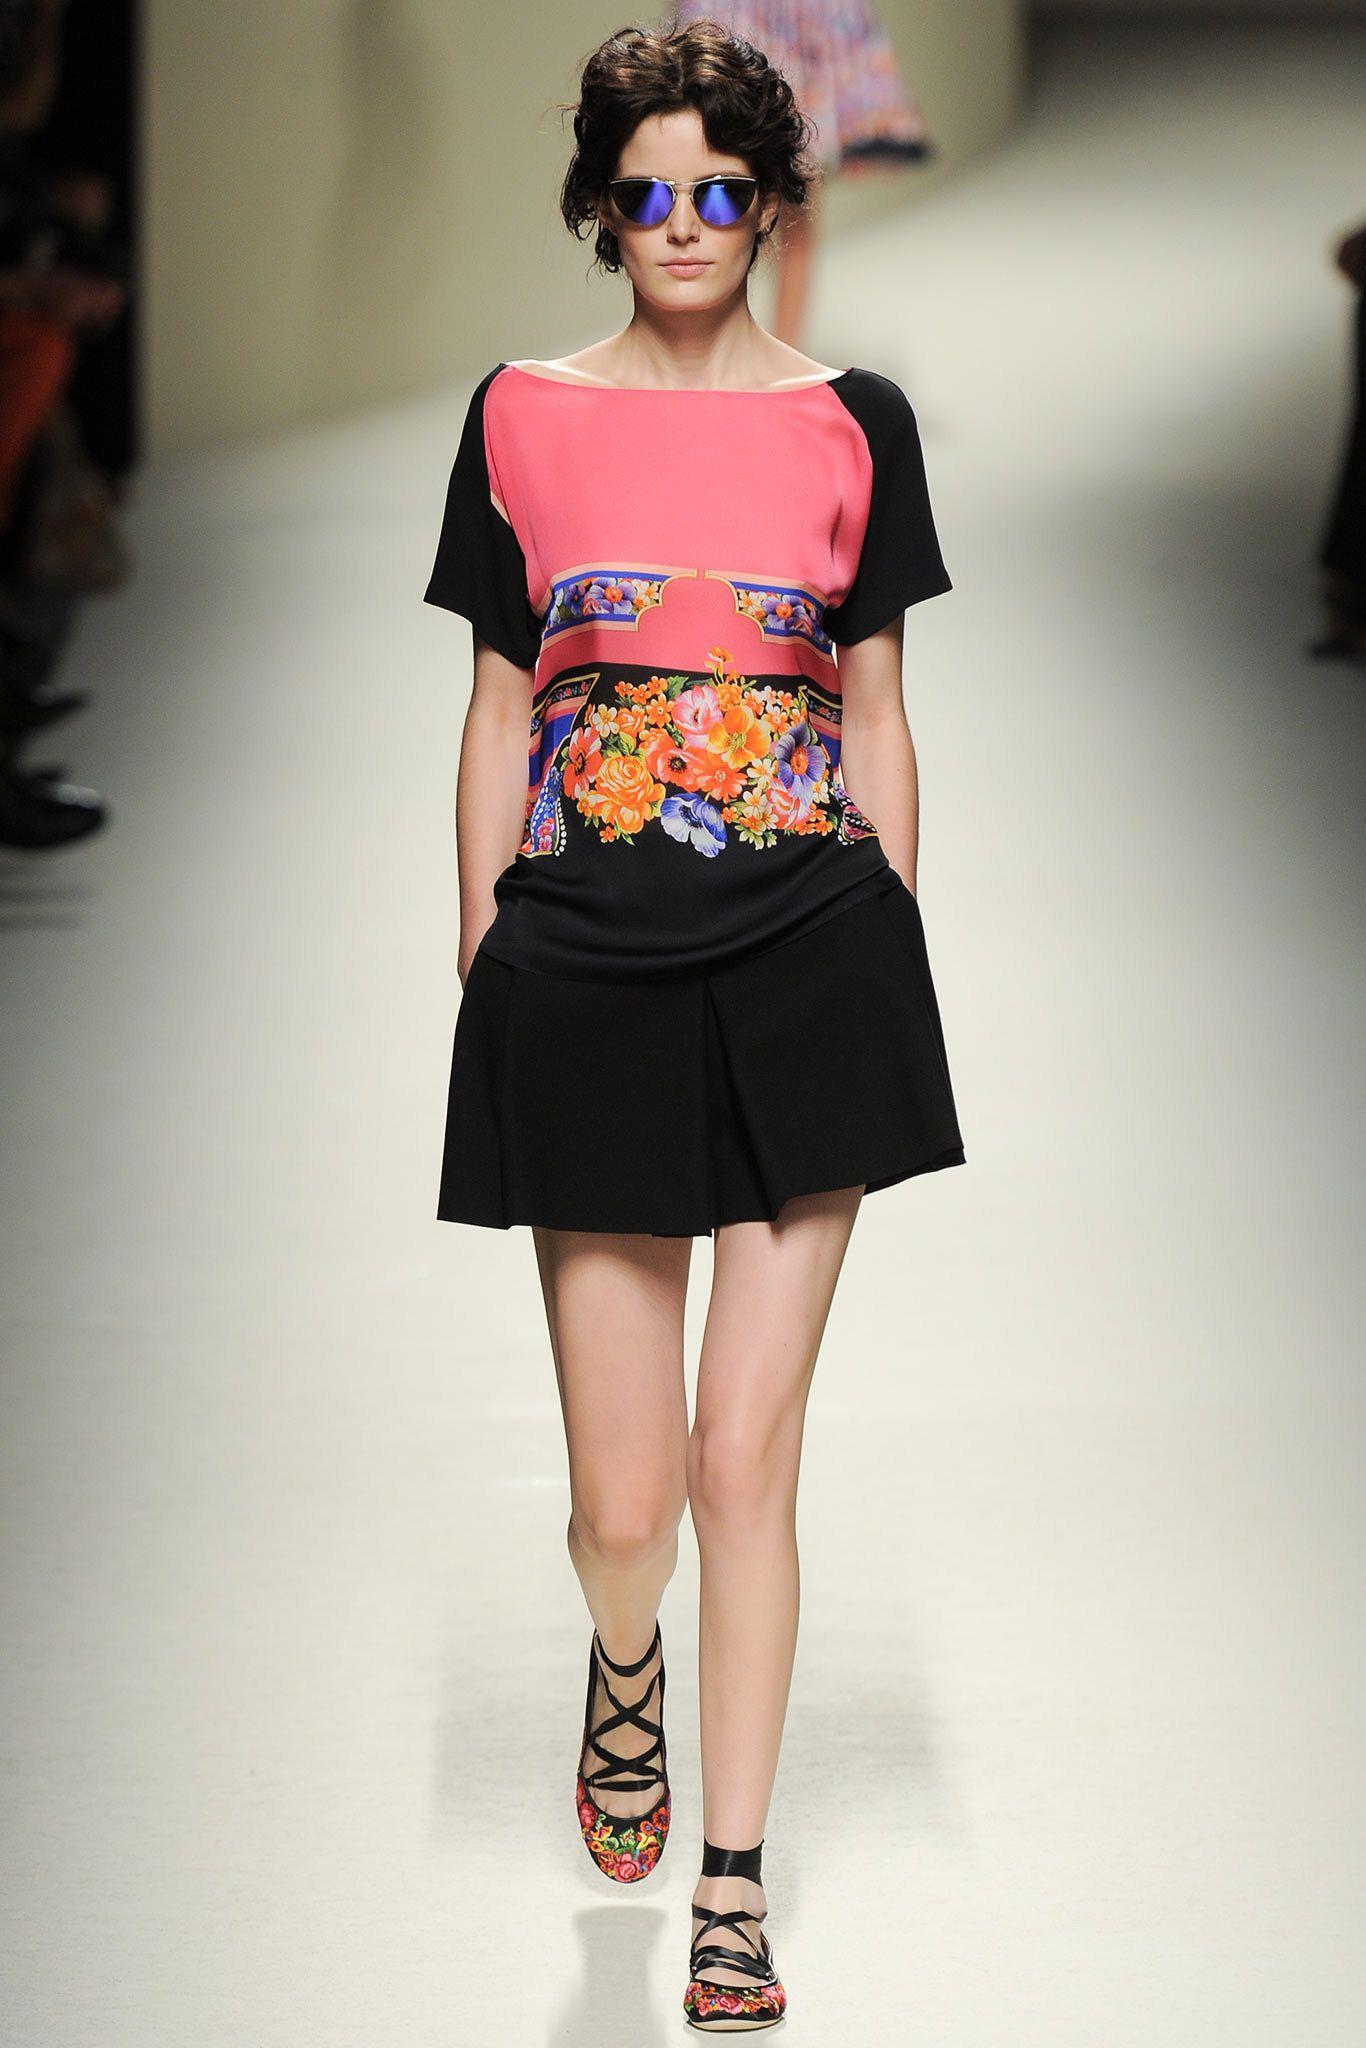 Alberta Ferretti Spring 2014 Ready-to-Wear Fashion Show - Ophelie Guillermand